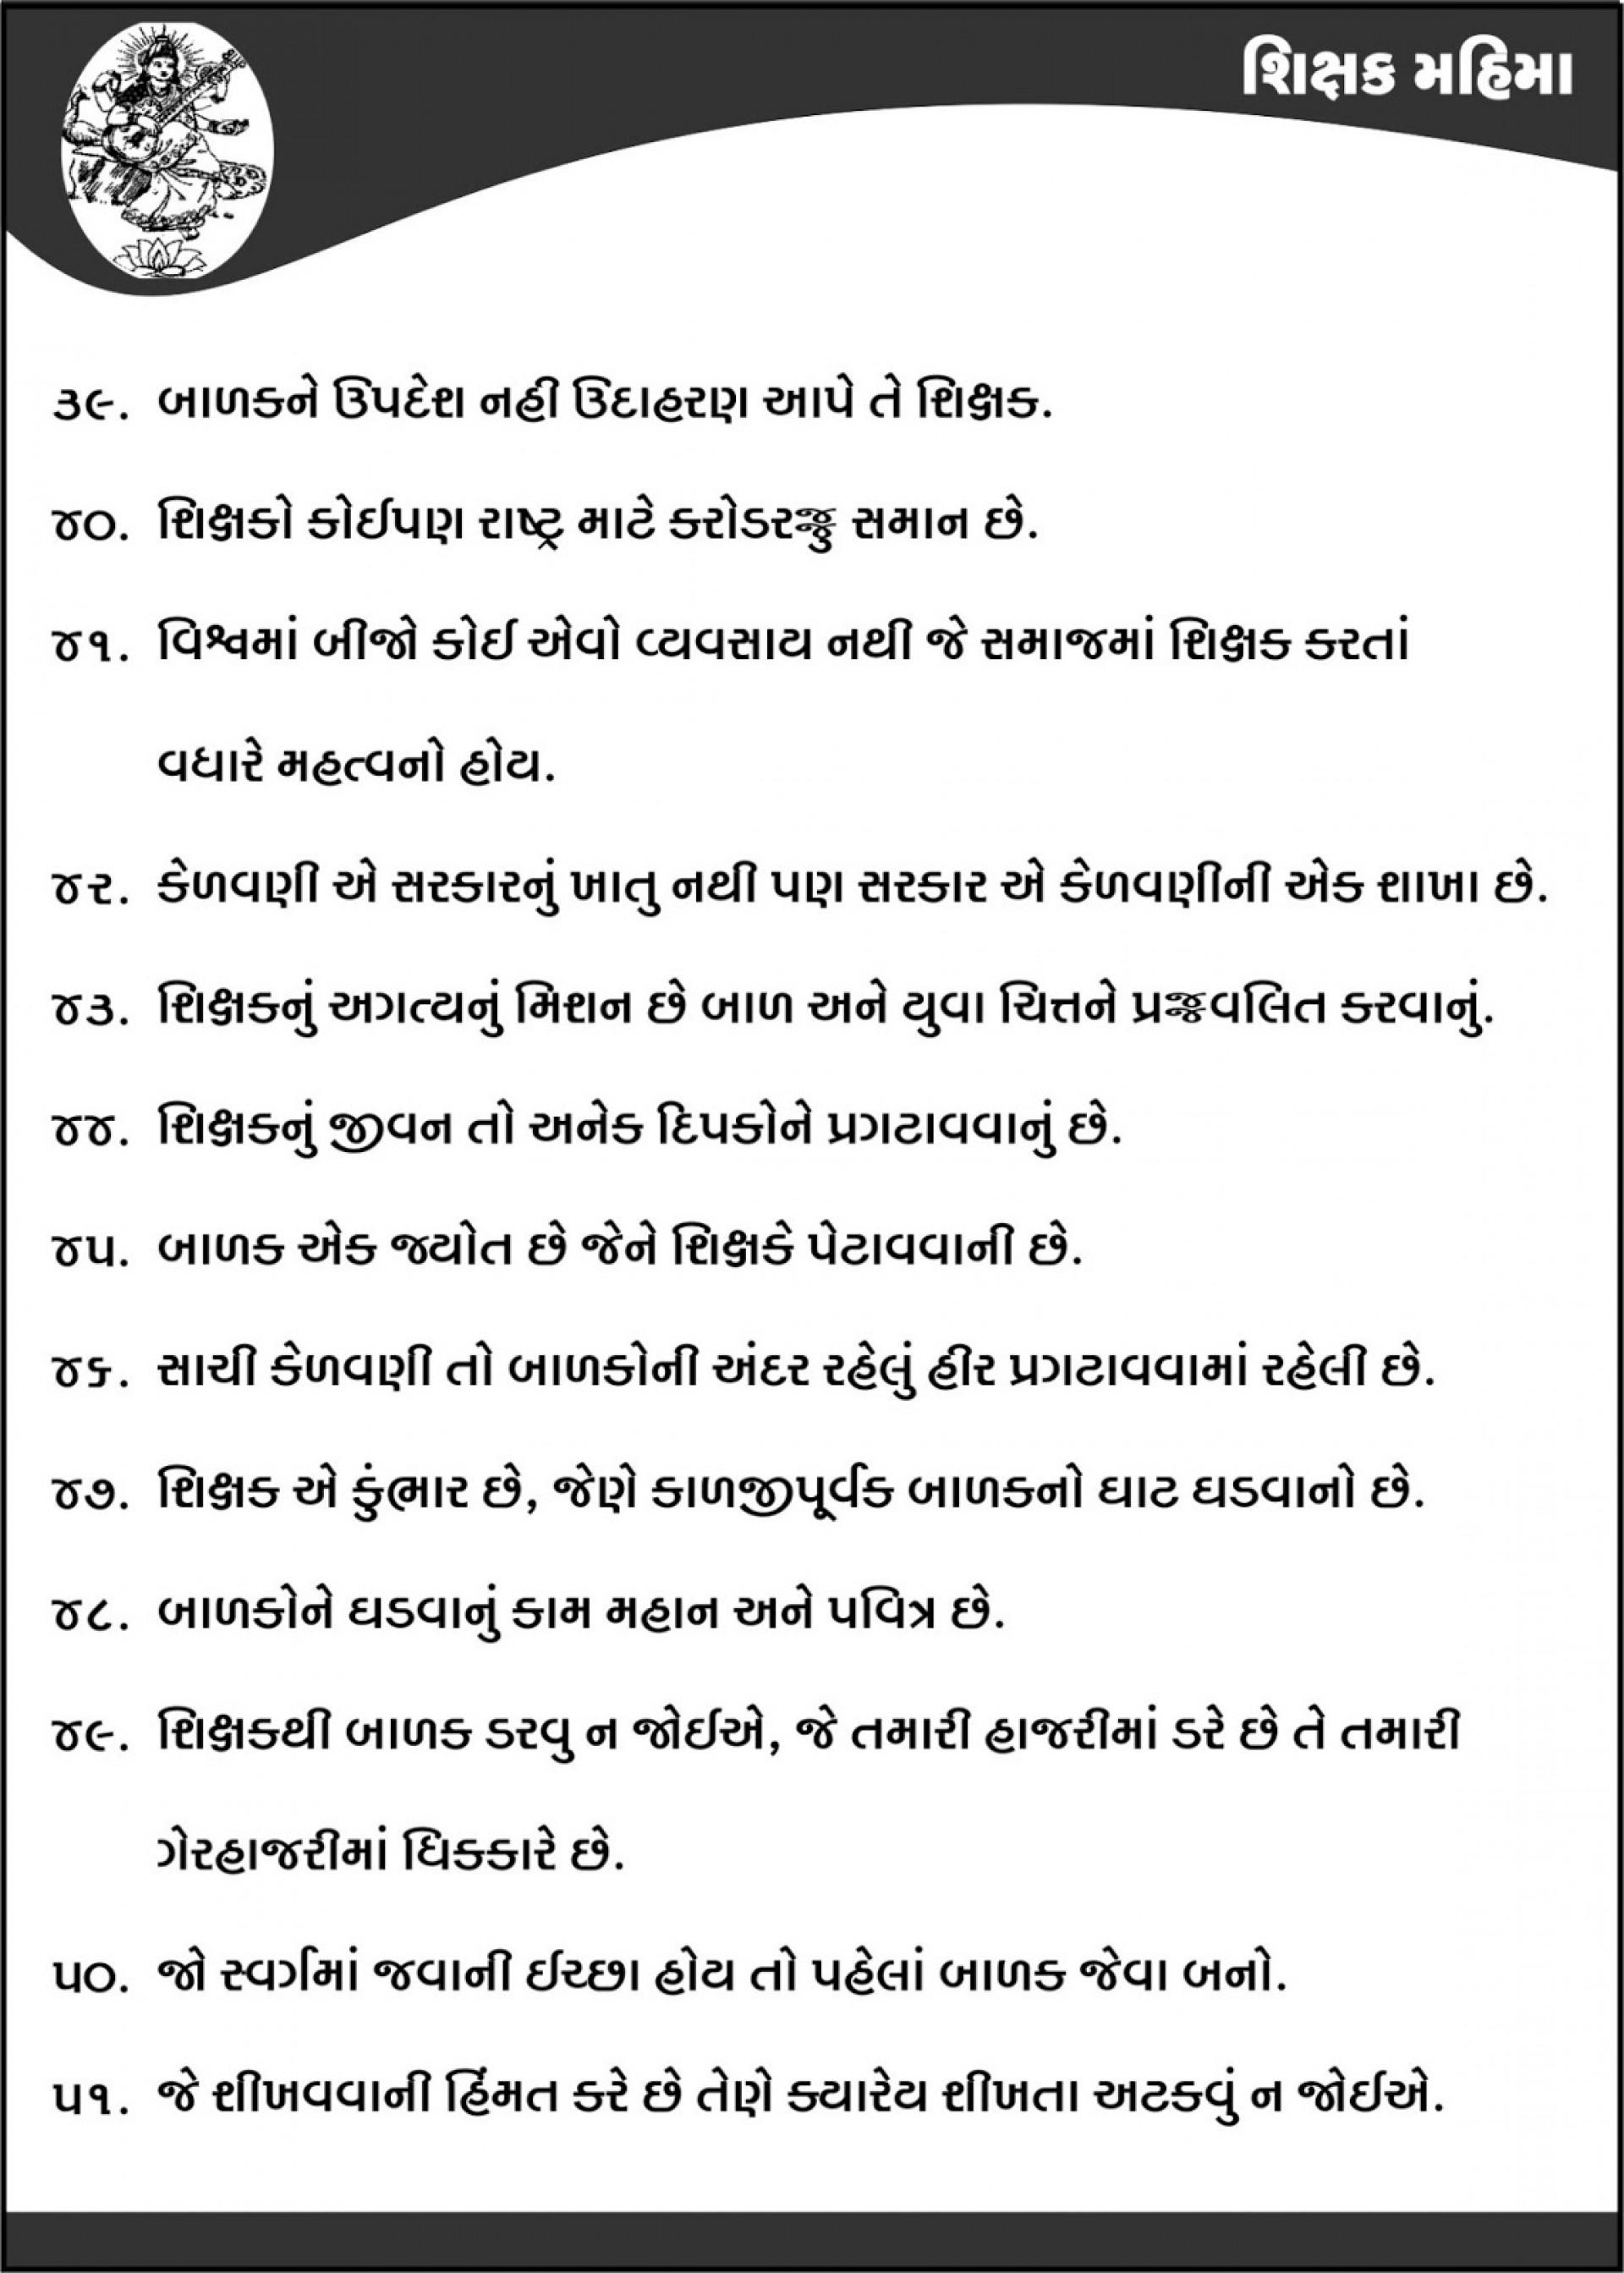 004 Essay Example25252bglories25252b4 On Marvelous Teacher Teachers Day In Odia Argumentative Carrying Guns Importance Hindi 1920